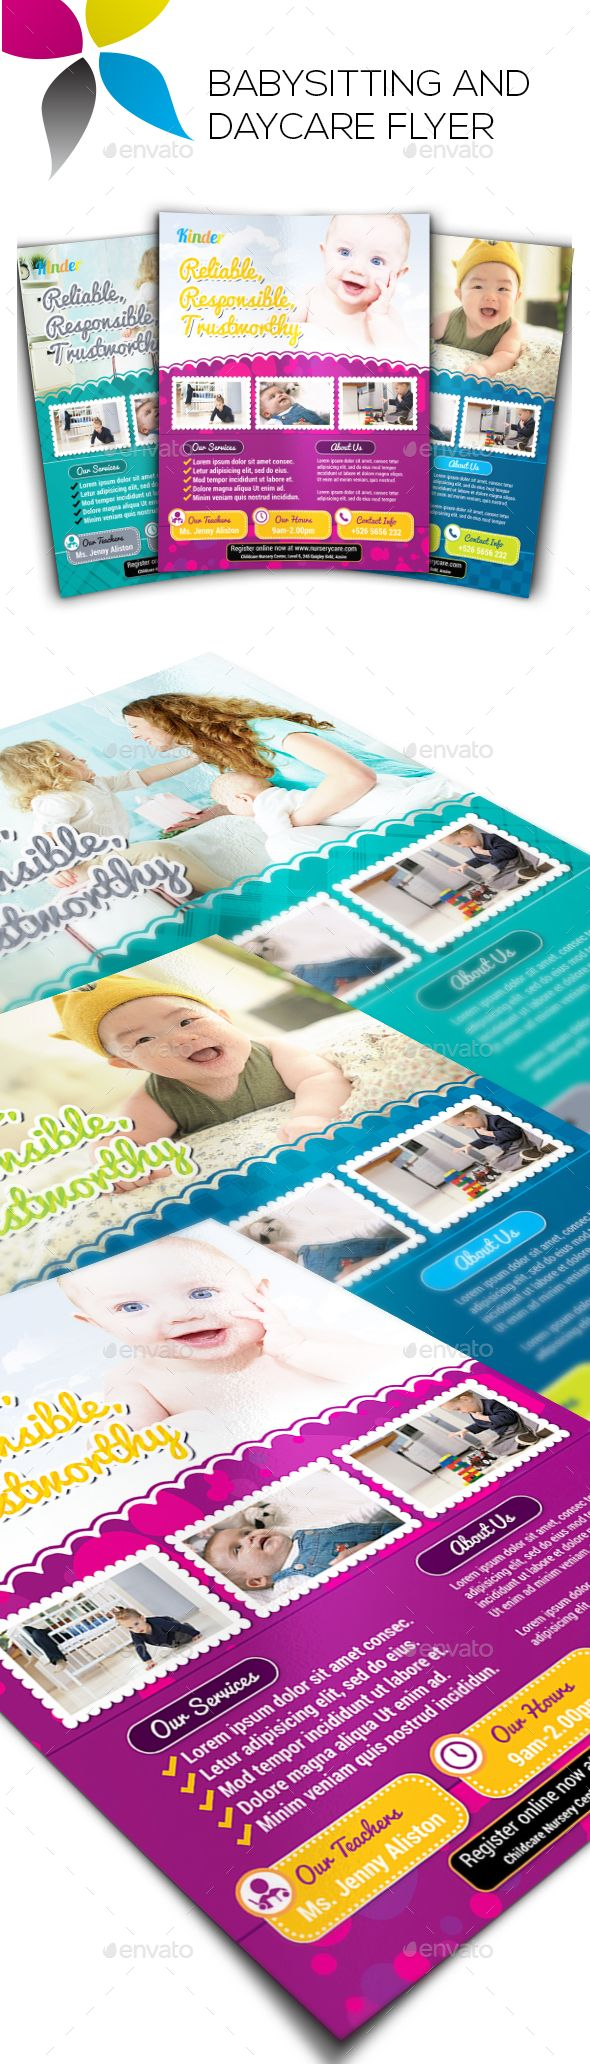 Babysitting And Daycare Flyers Babysitting Flyer Design Templates